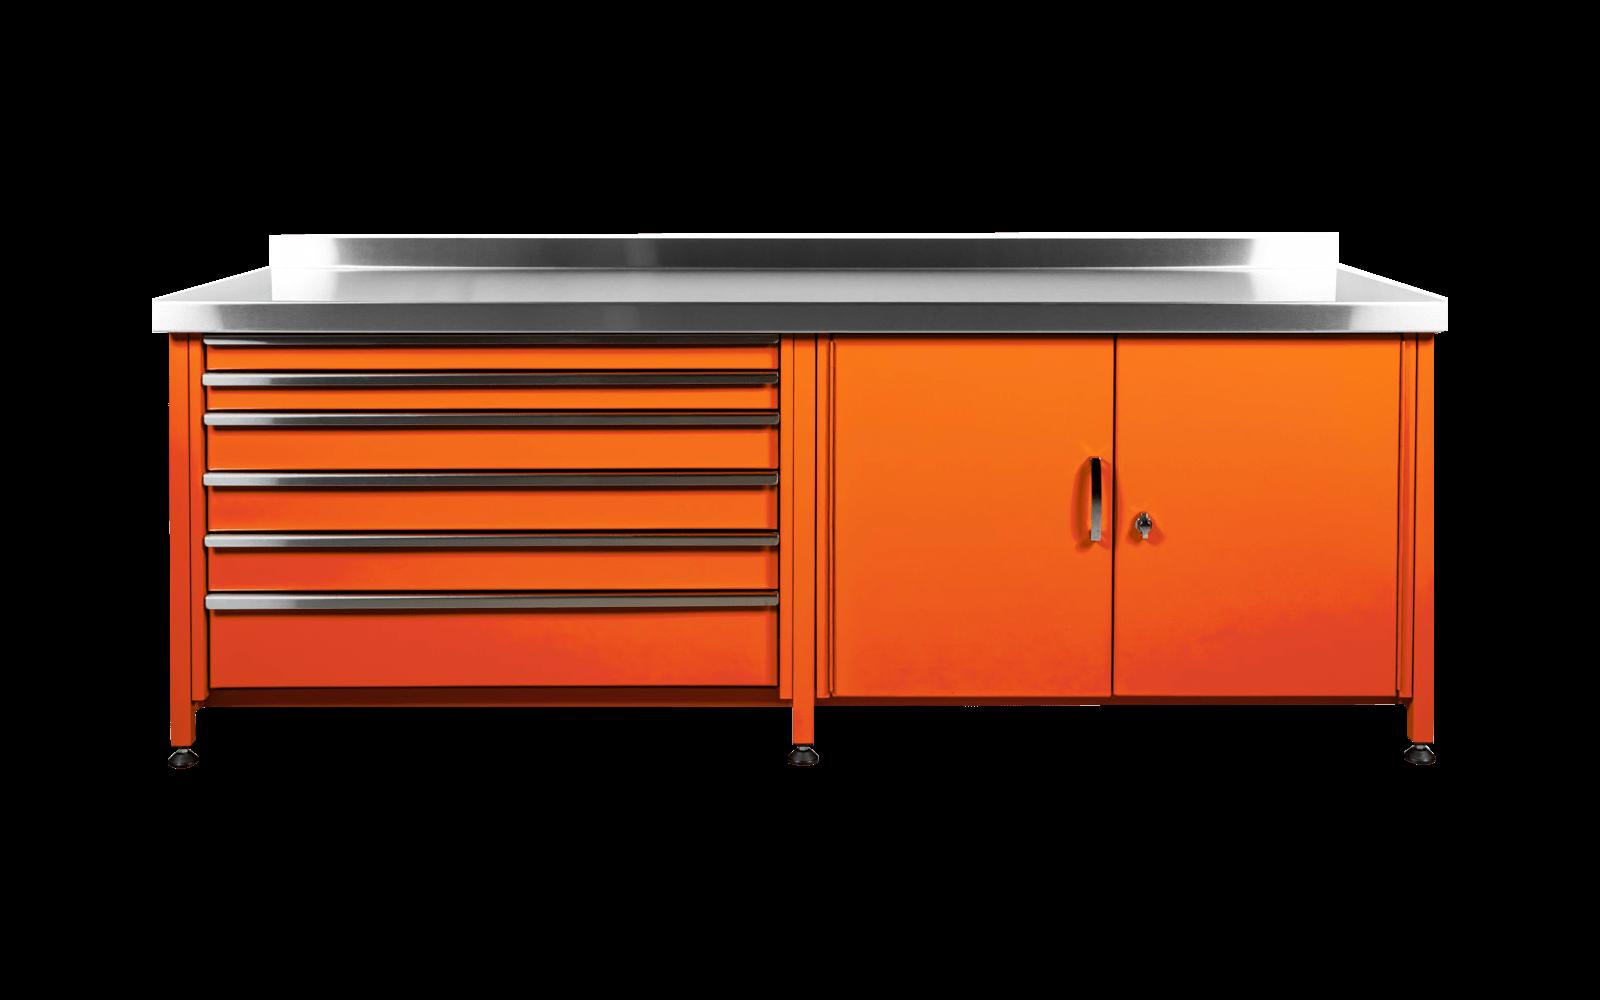 wb2-6sxlhc-f-orange